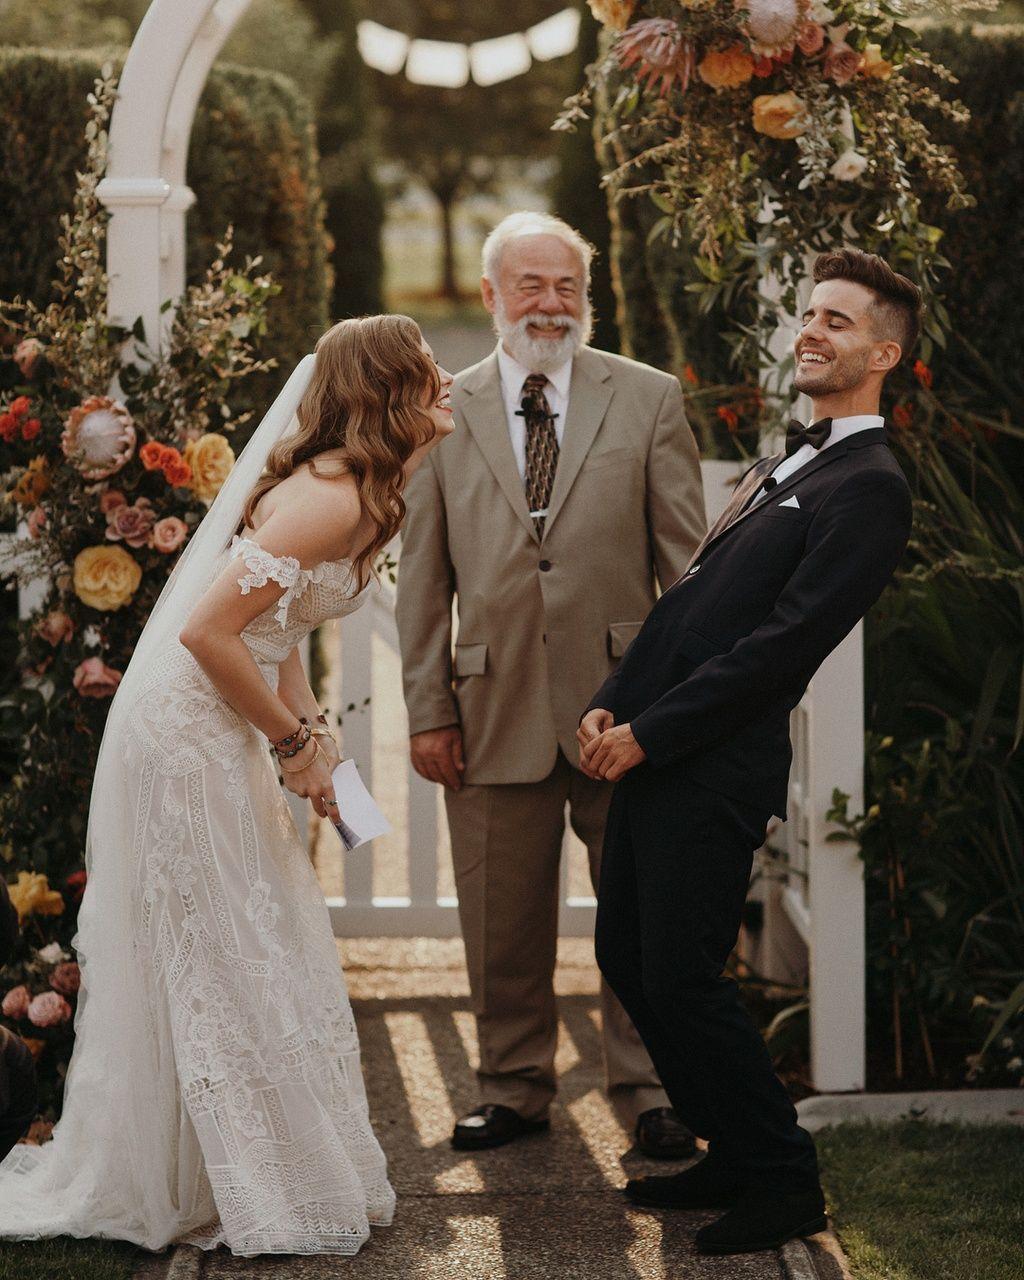 Here S The Lowdown On Friends Officiating Weddings Ruffled In 2020 Wedding Beauty Hacks Blackheads Beauty Hacks Dark Circles